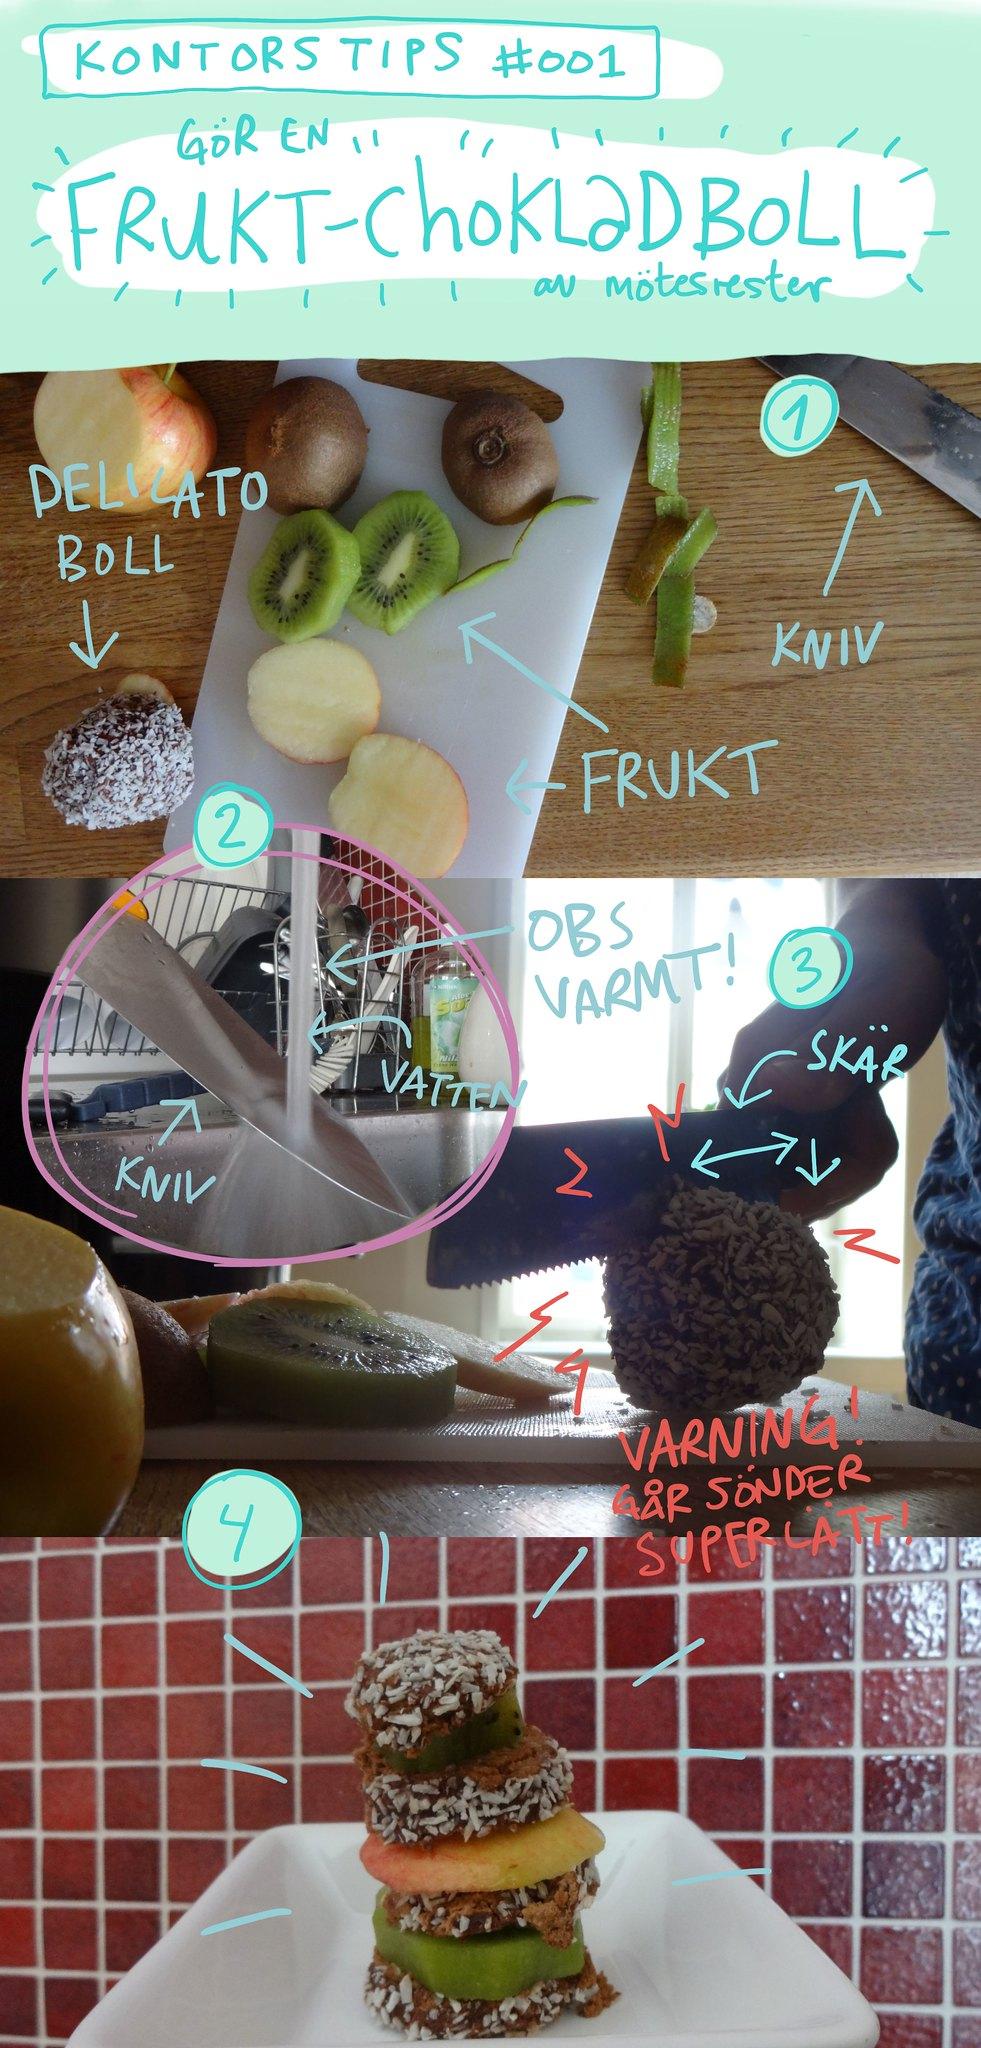 fruktchoklaboll